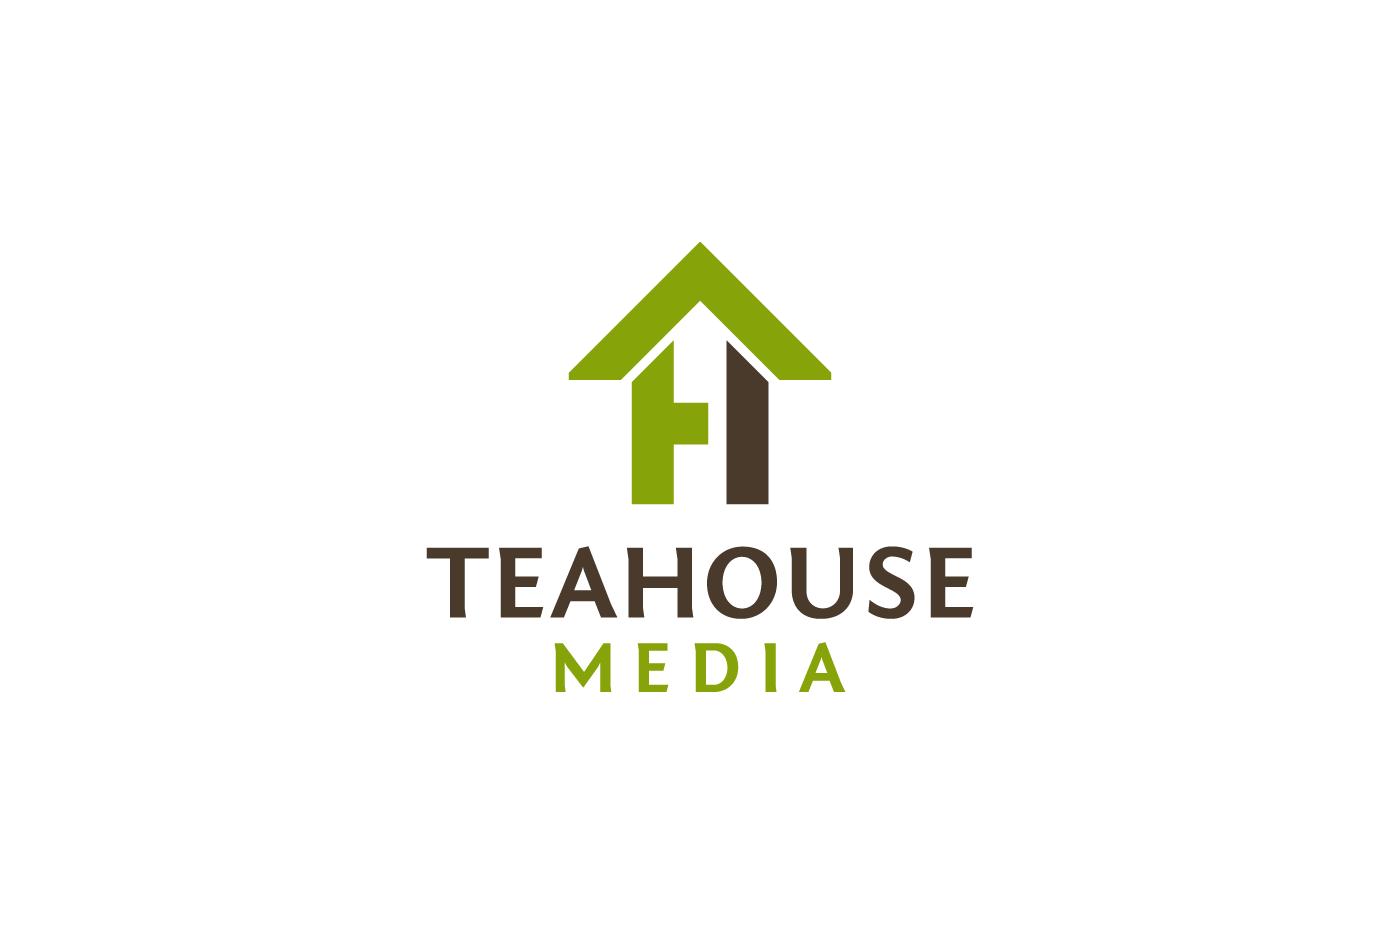 Teahouse Media logo